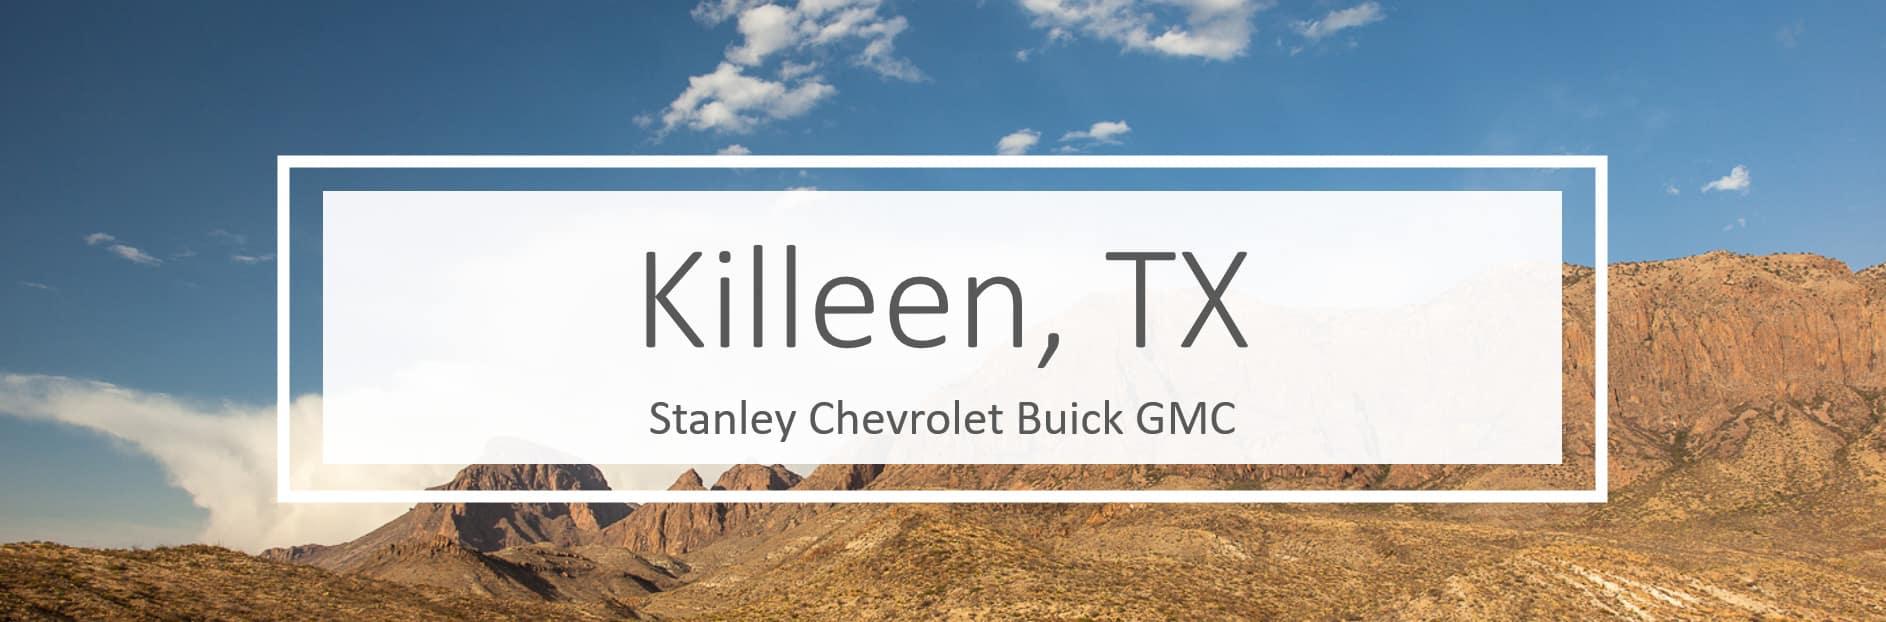 Chevrolet Buick GMC Dealer Serving Killeen